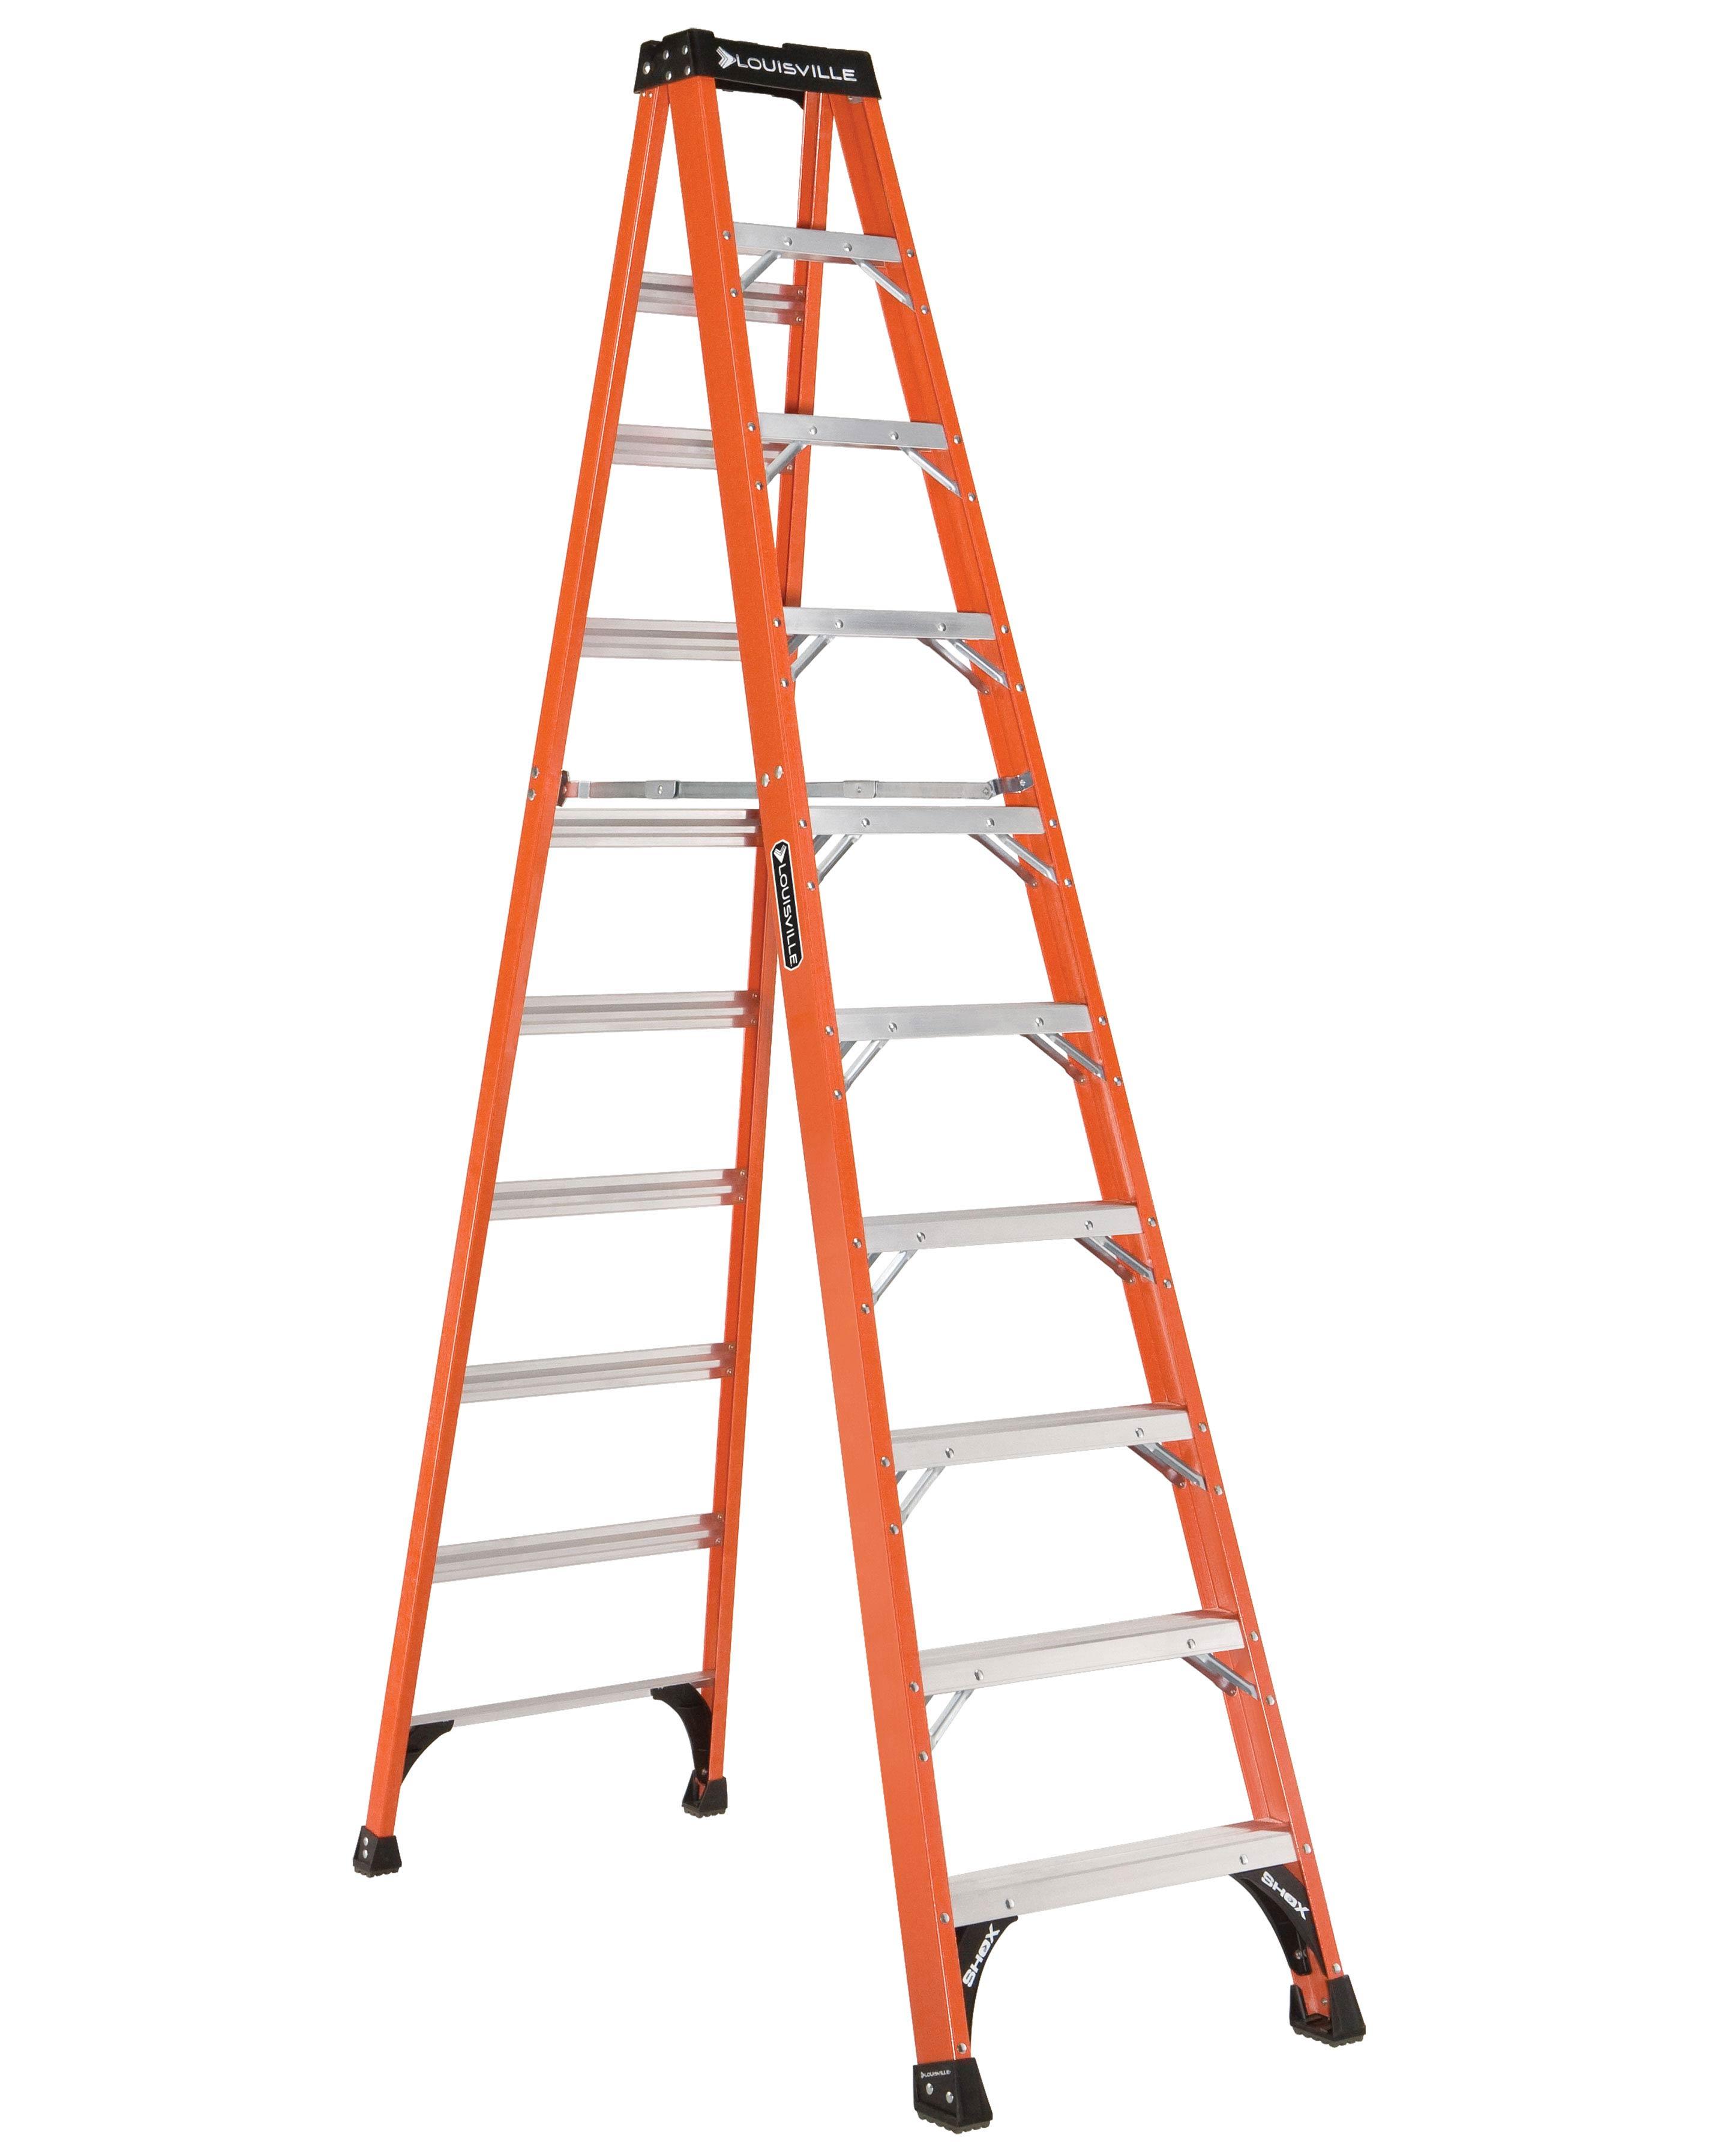 LOUISVILLE LADDERS 10 ft Fiberglass Standard Step Ladders